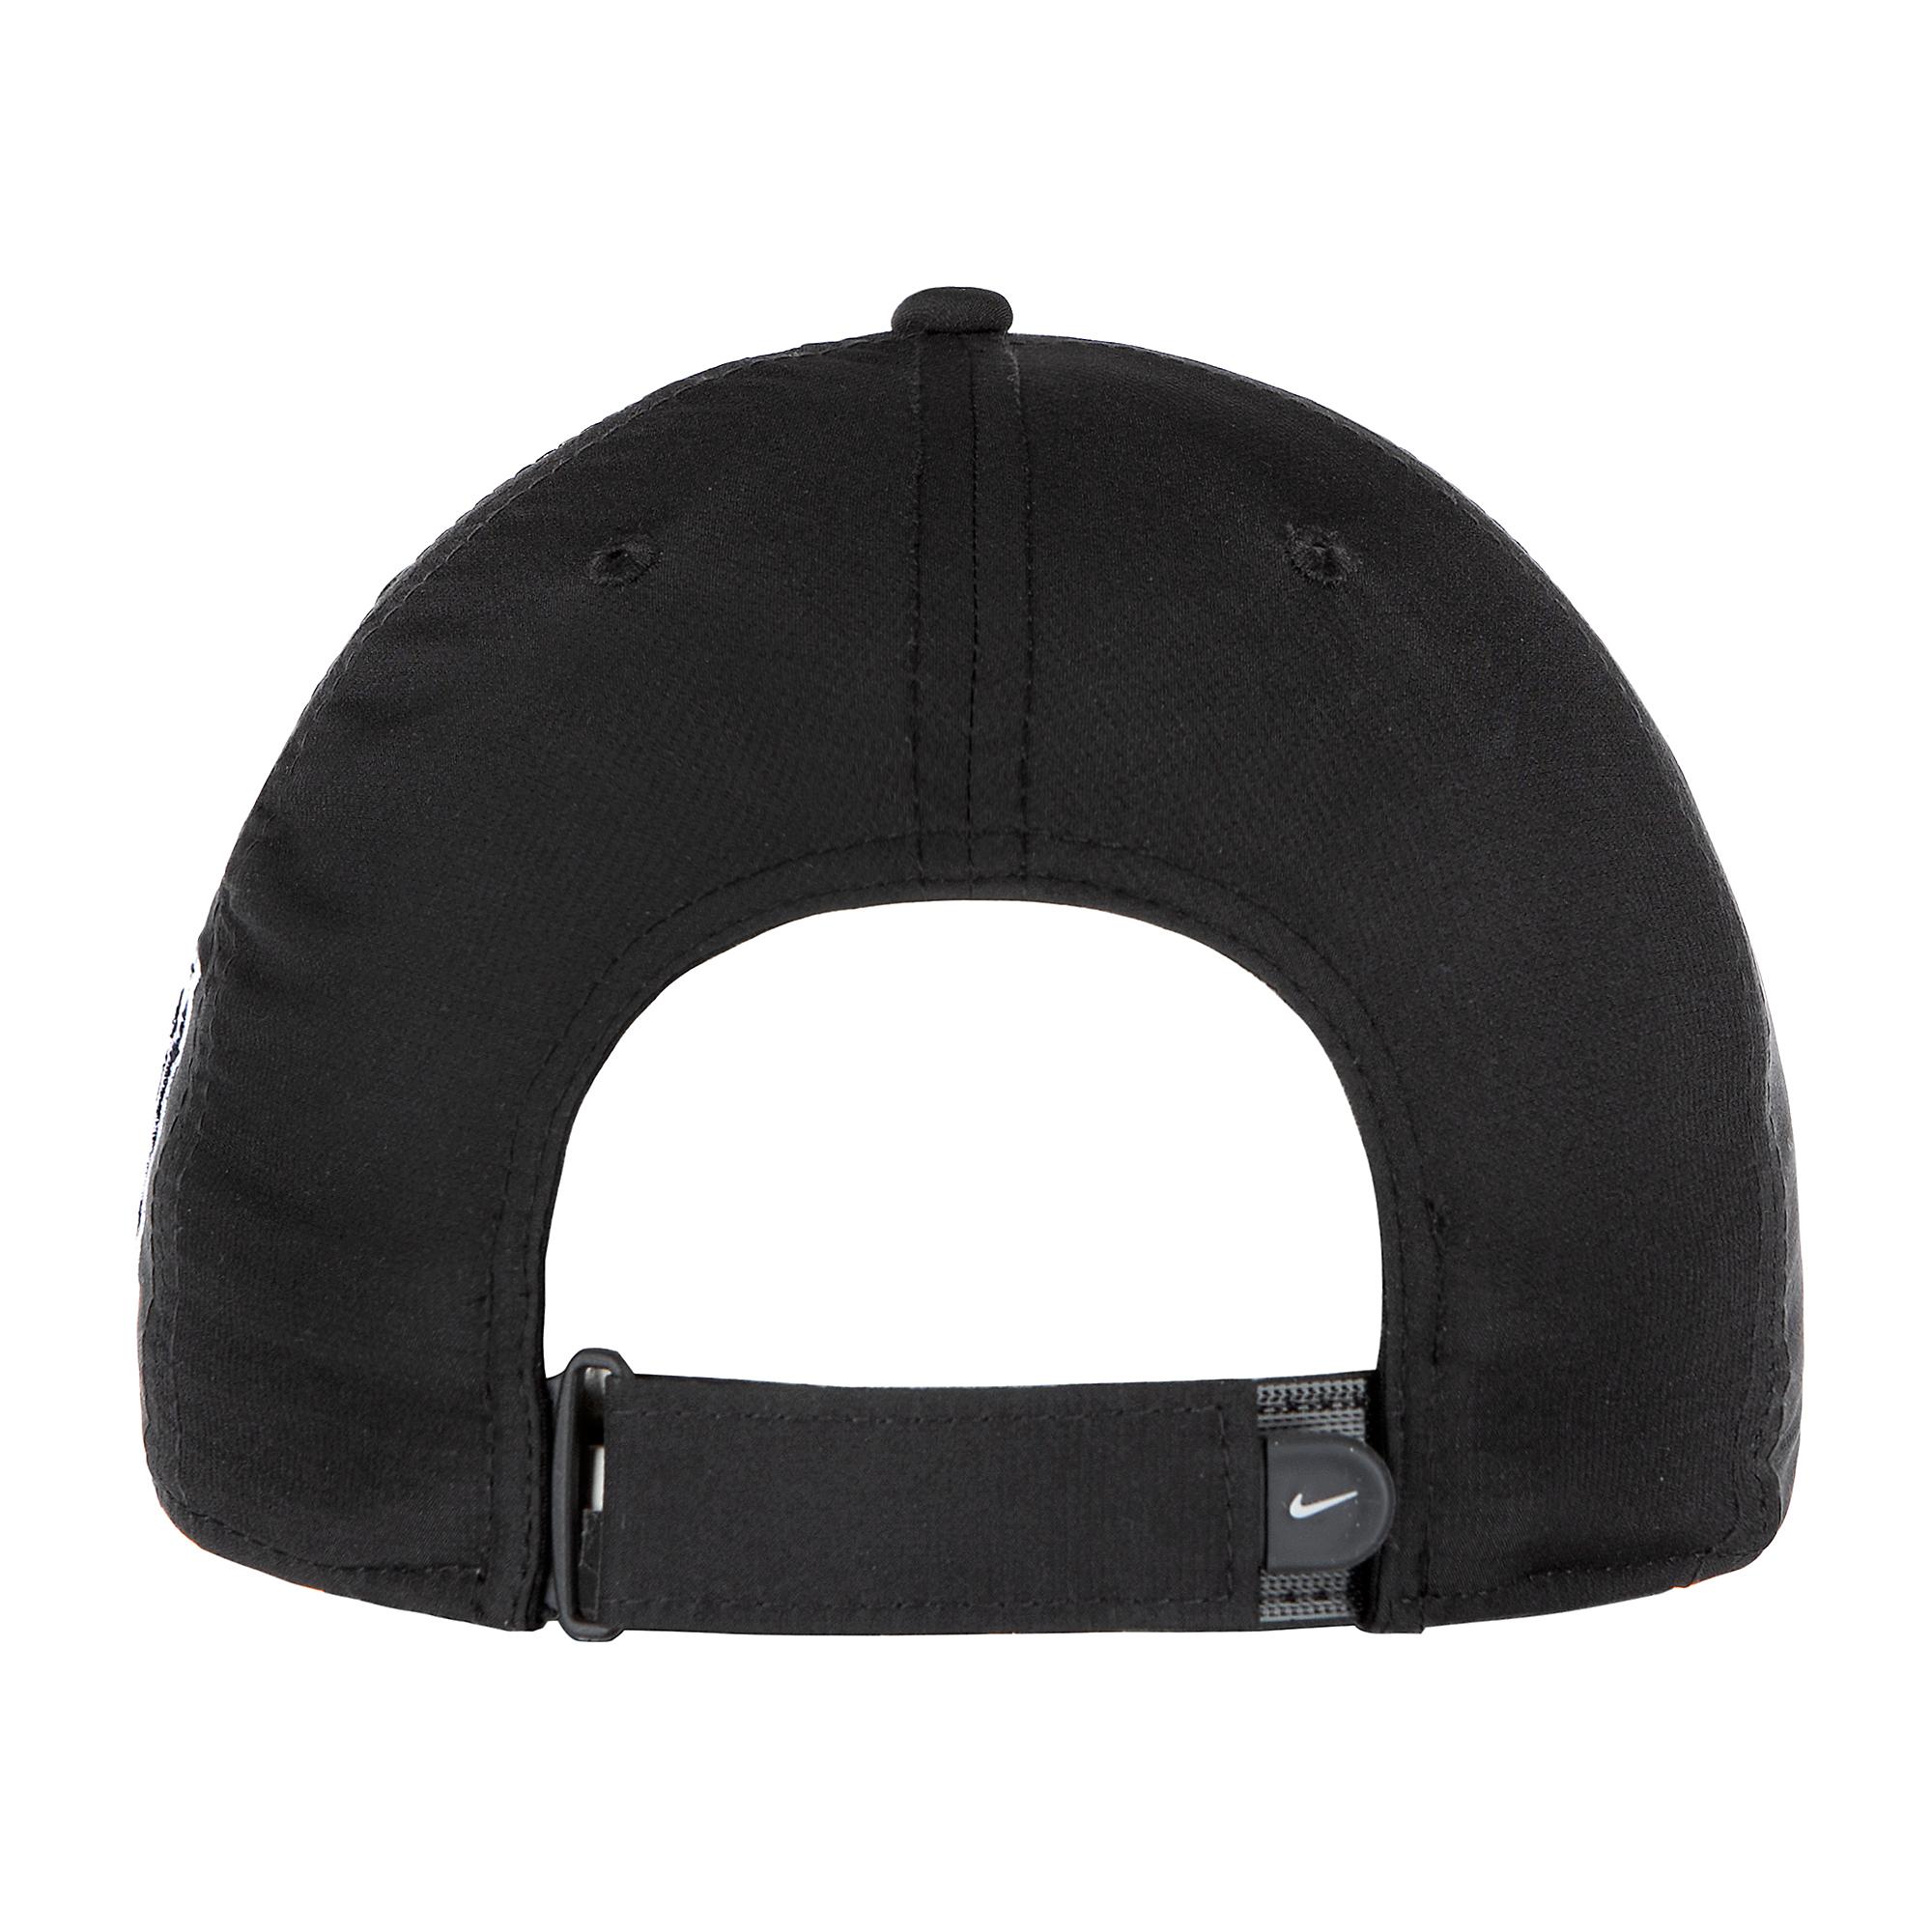 5b78c9437 Dallas Cowboys Nike Youth Black Golf Cap | Dallas Cowboys Pro Shop